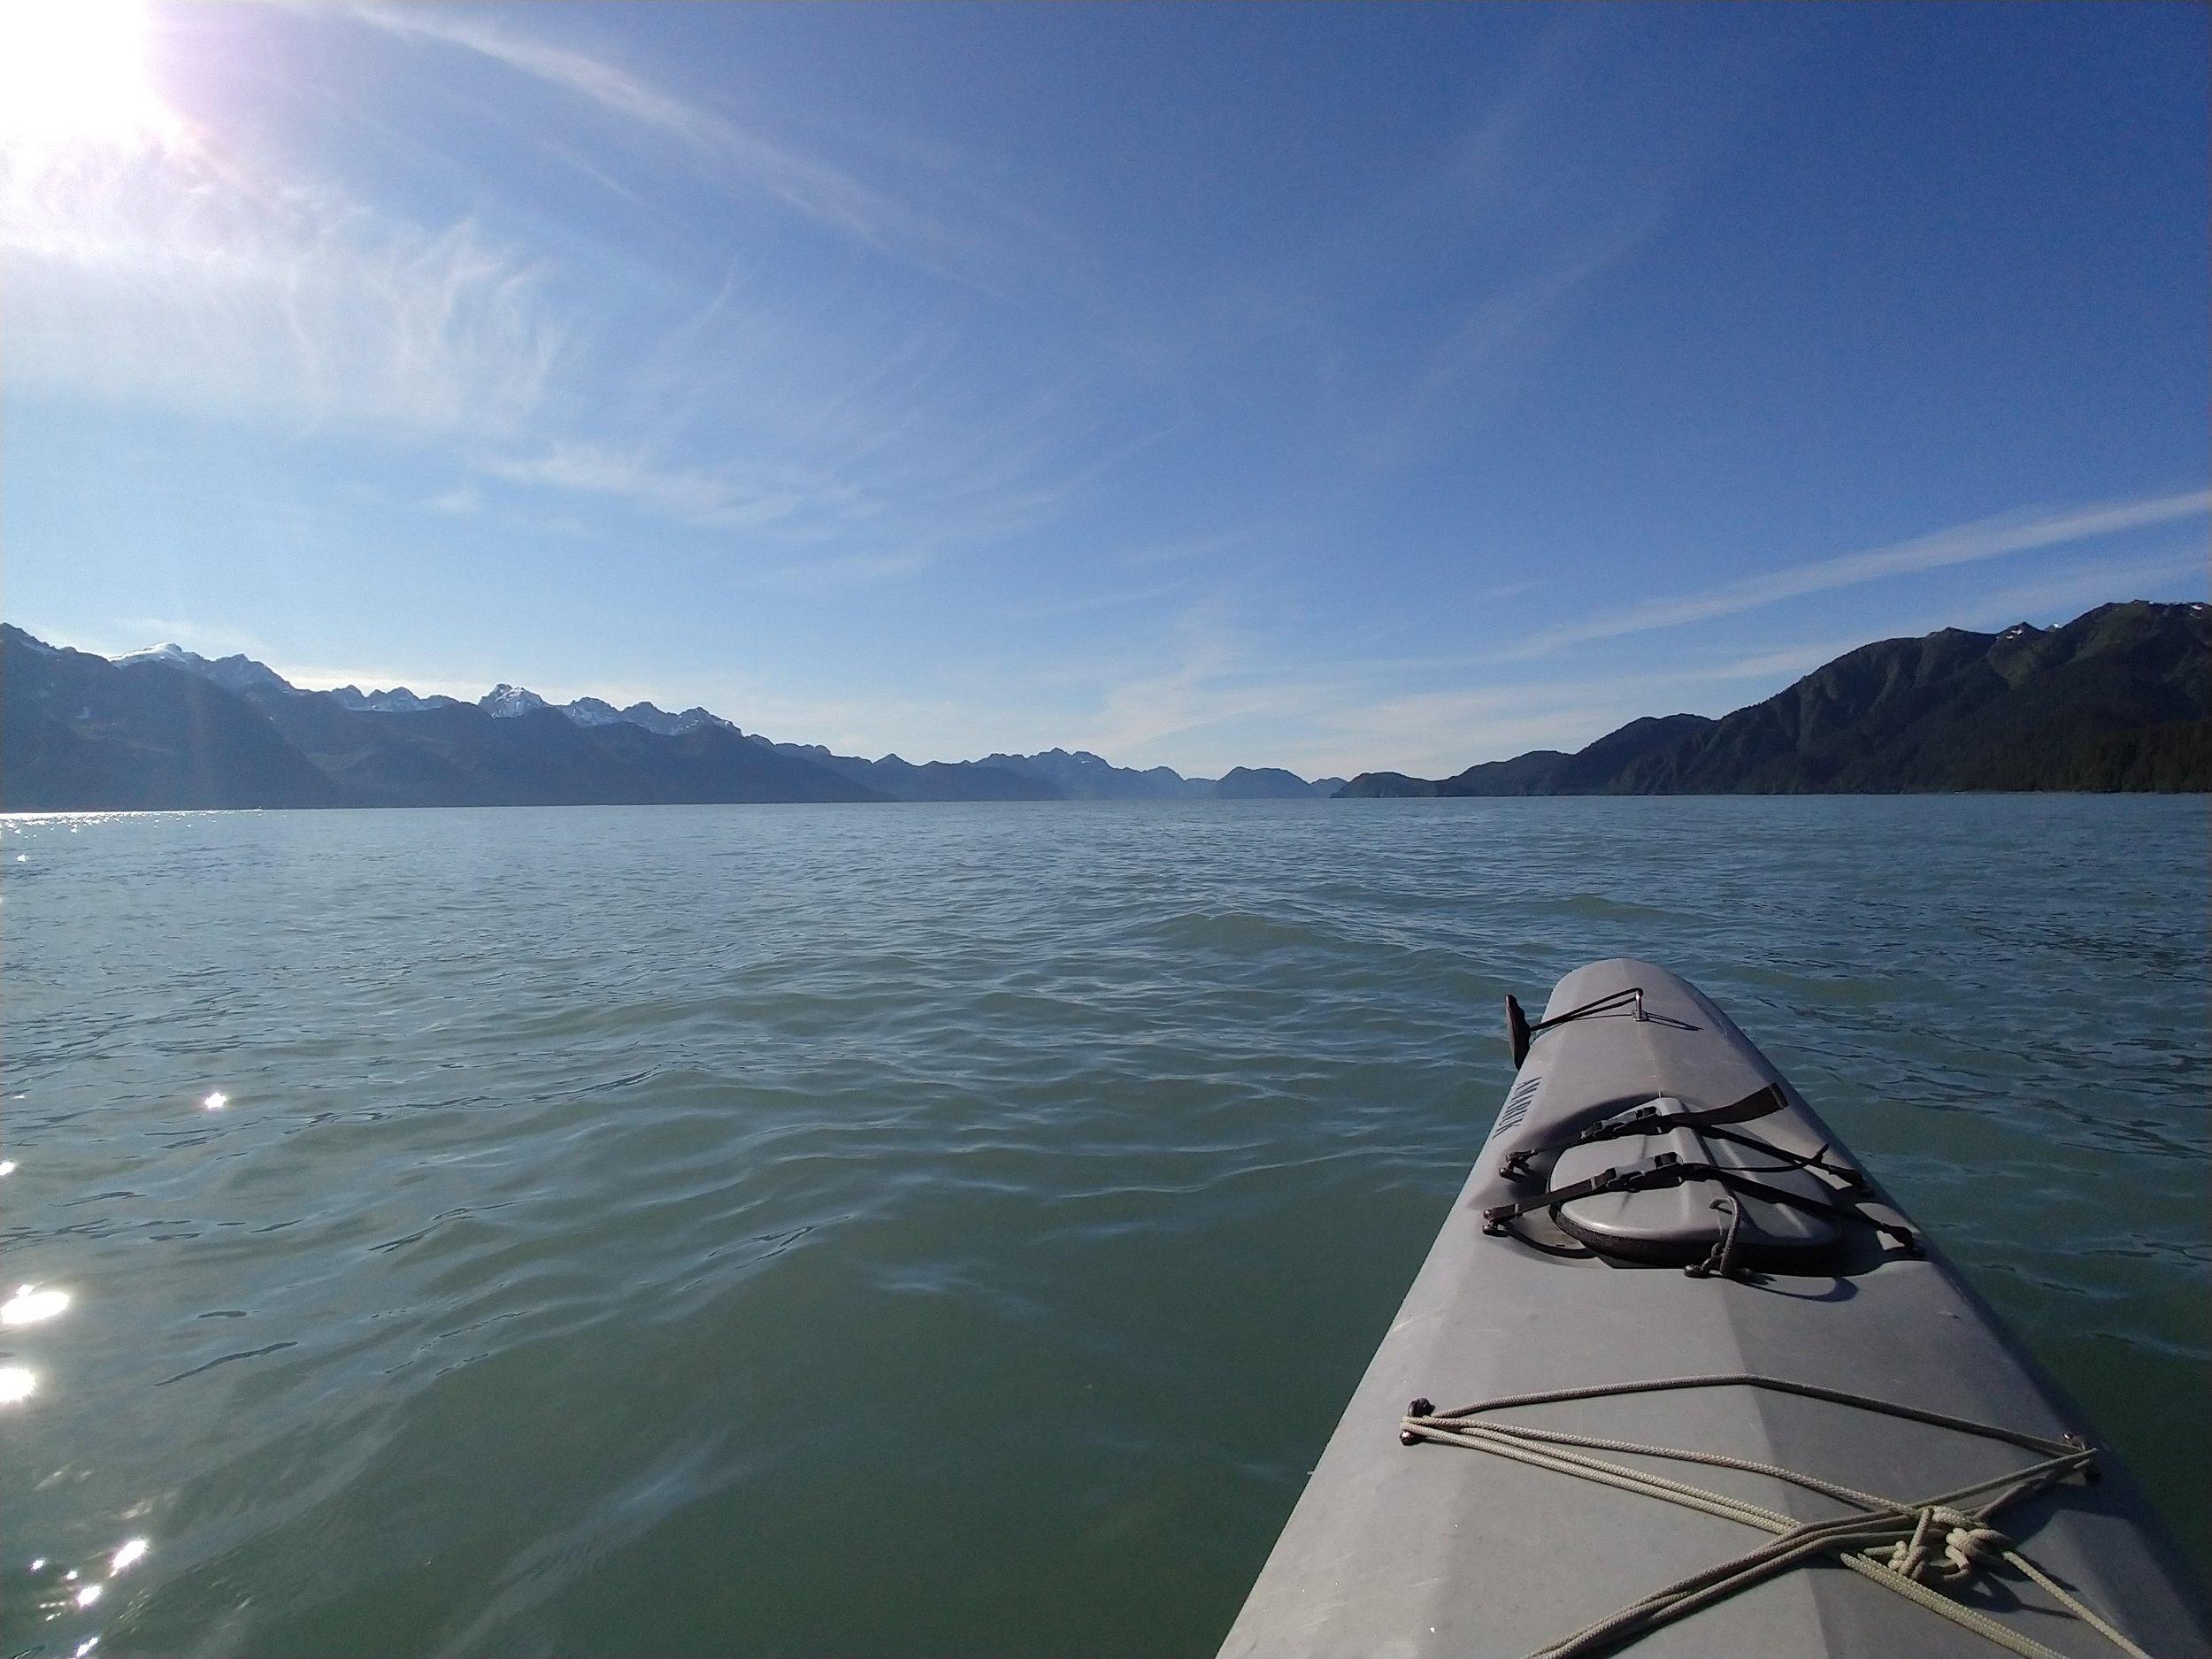 Kayak, Miller's Crossing